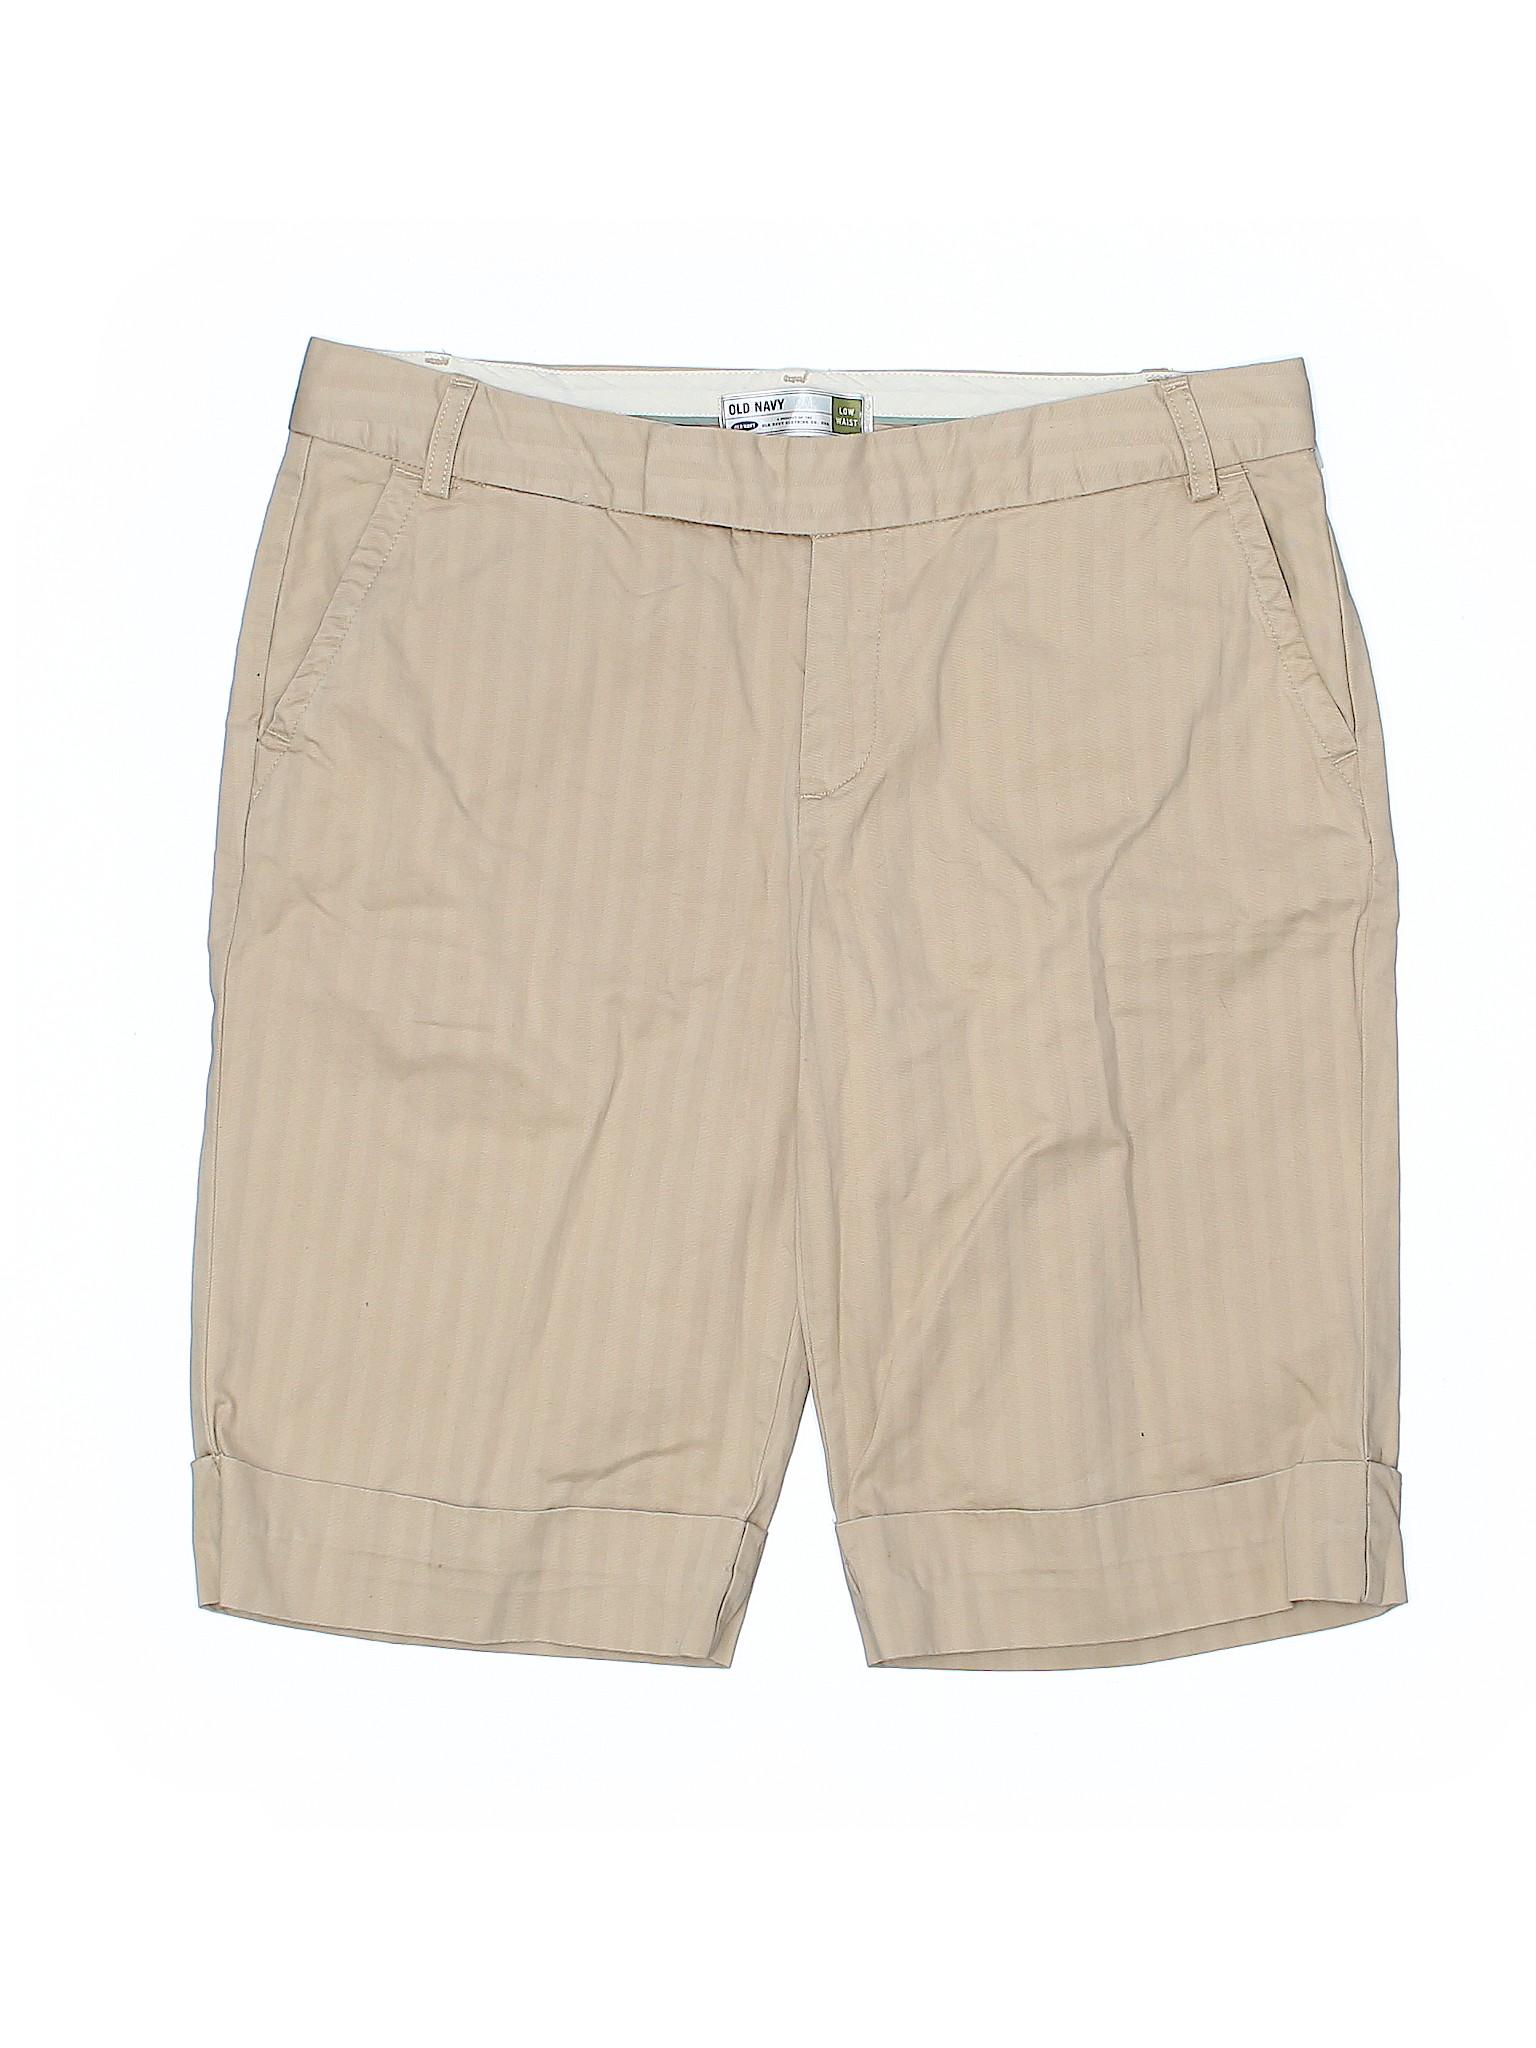 Navy Navy Boutique Navy Old Old Shorts Khaki Boutique Khaki Shorts Boutique Old CInqtwx7z